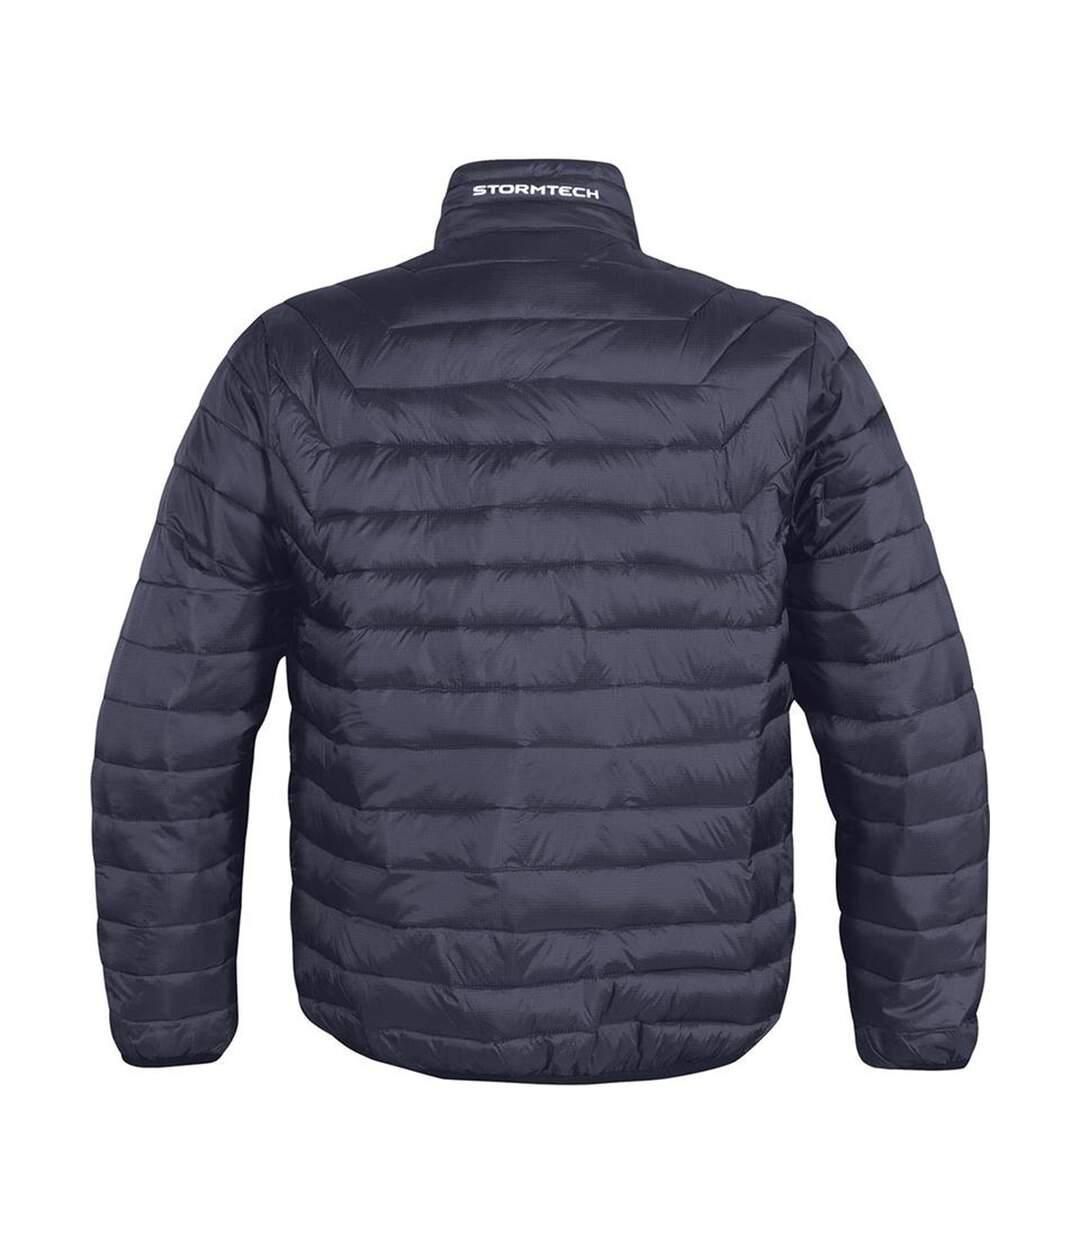 Stormtech Mens Thermal Altitude Jacket (Treetop Green/Black) - UTBC1180